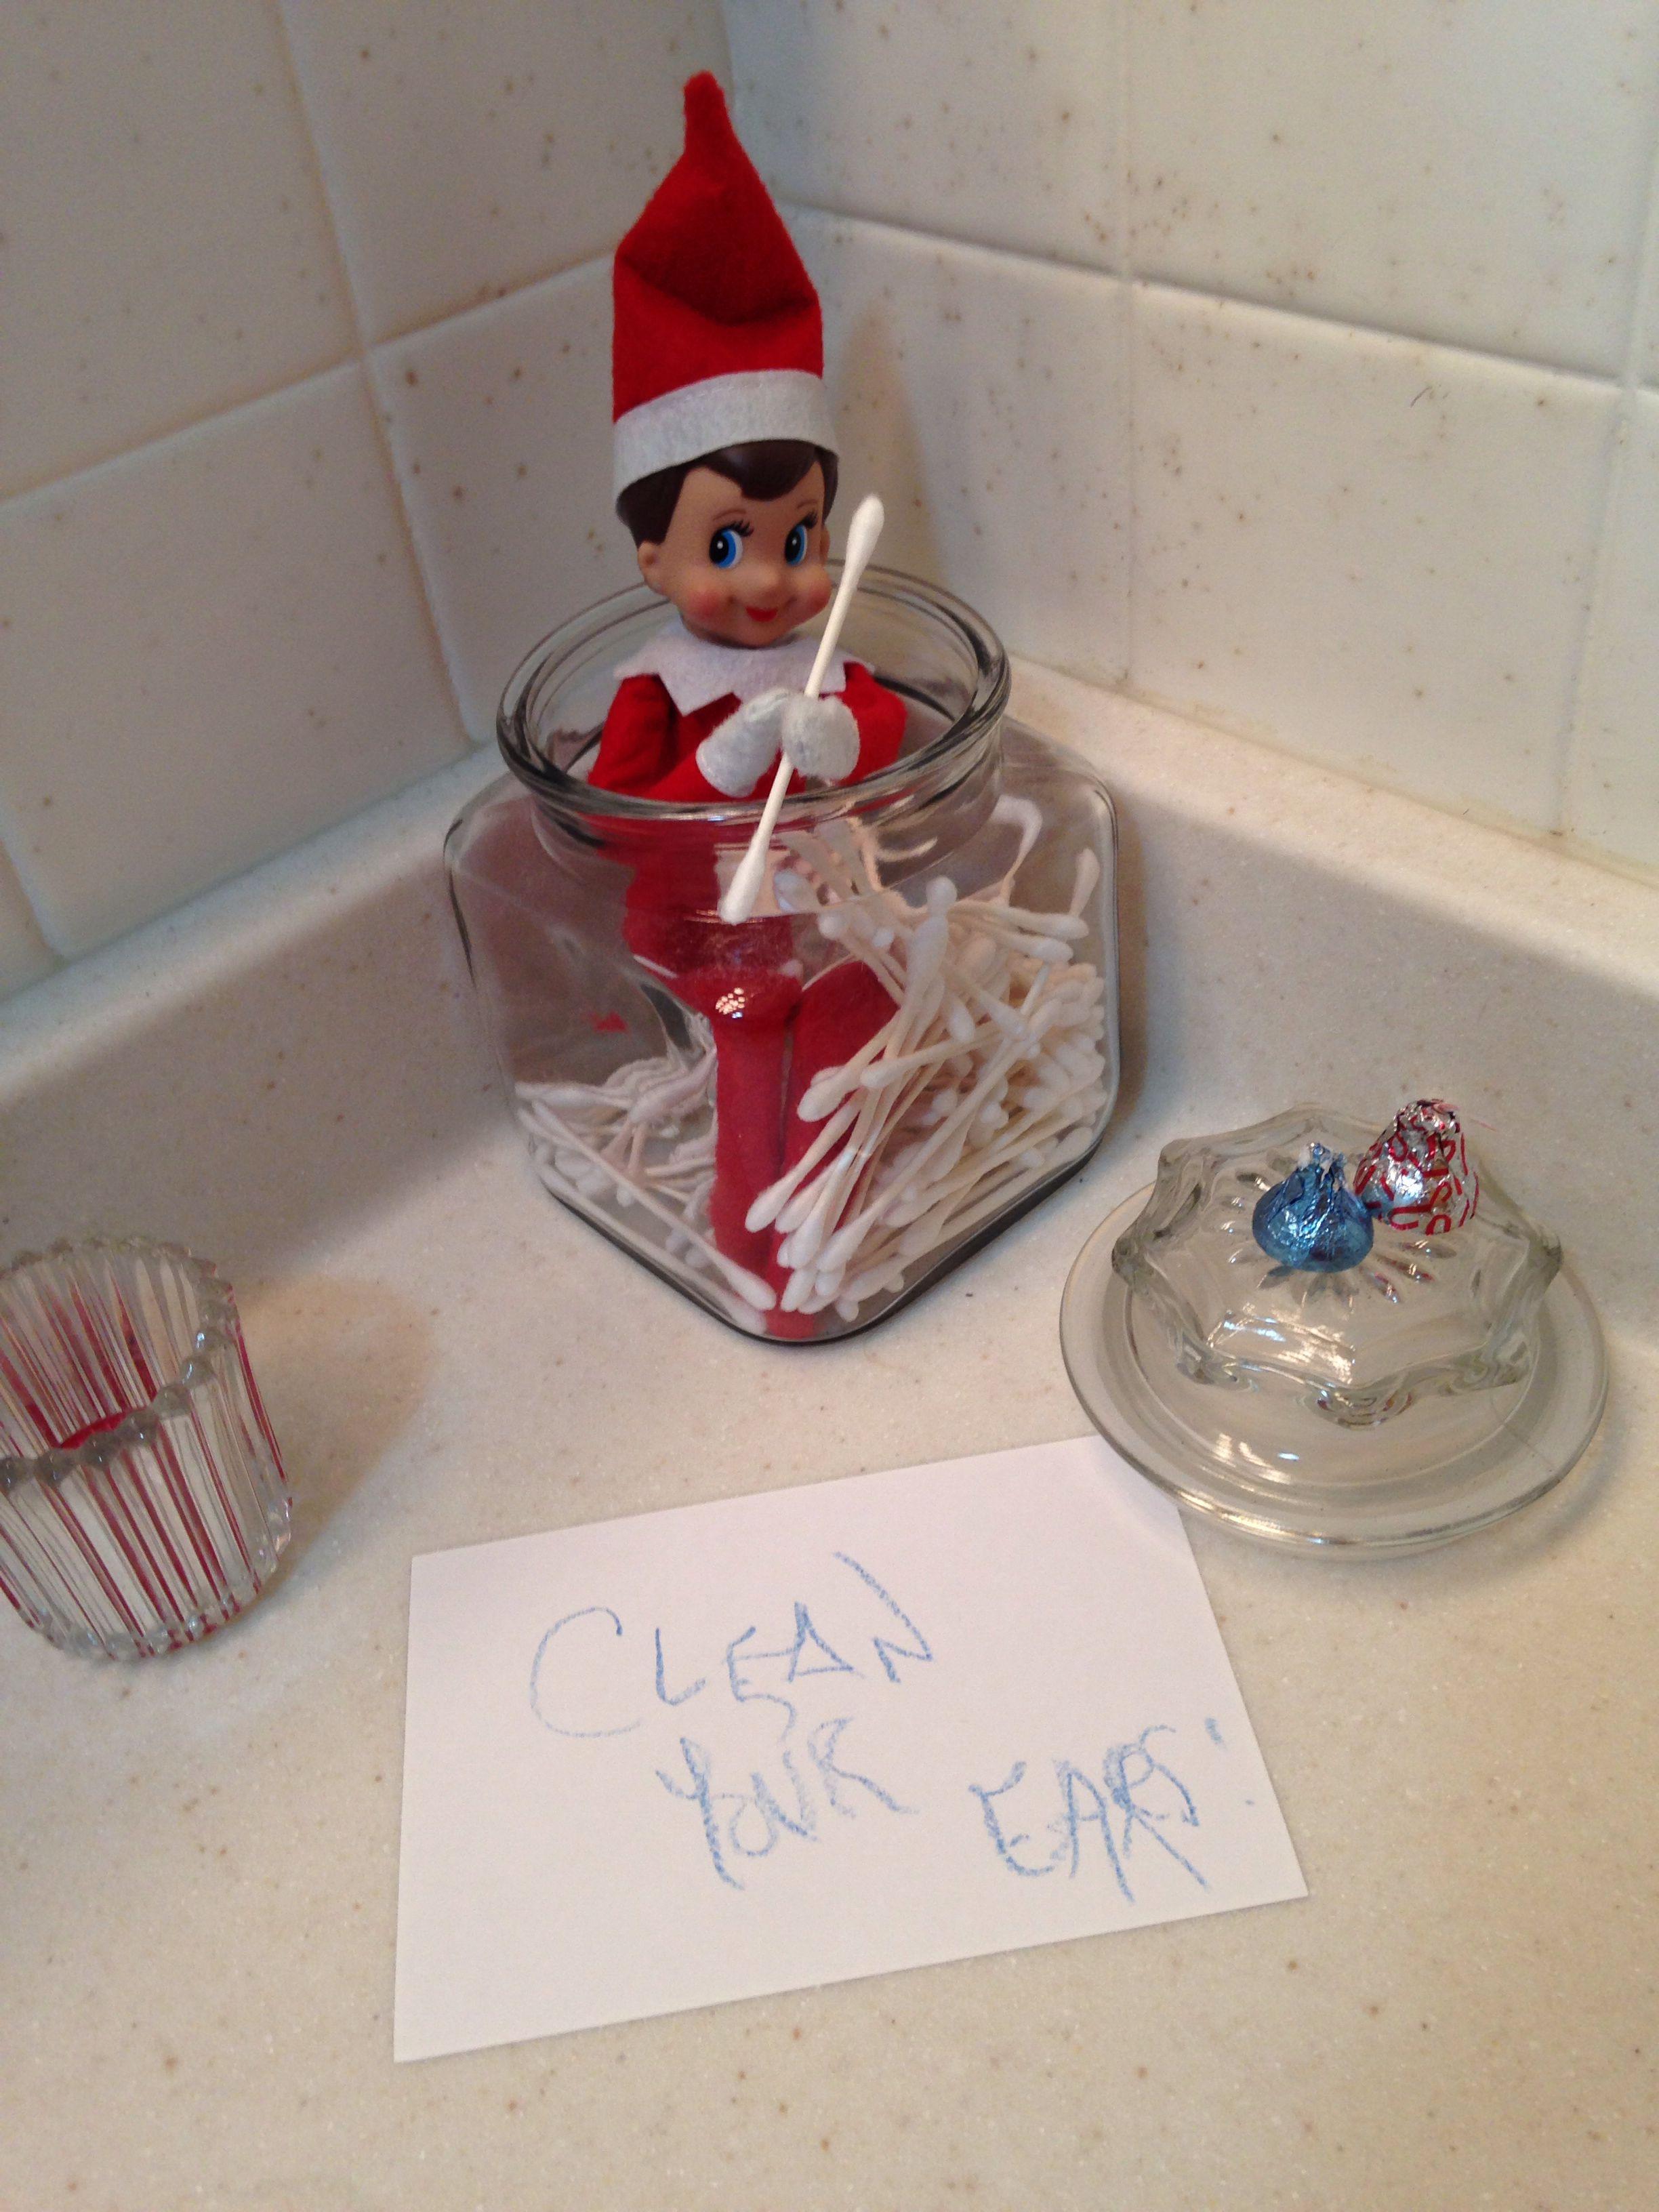 Elf Clean your ears Elf fun, Elf, Christmas entryway